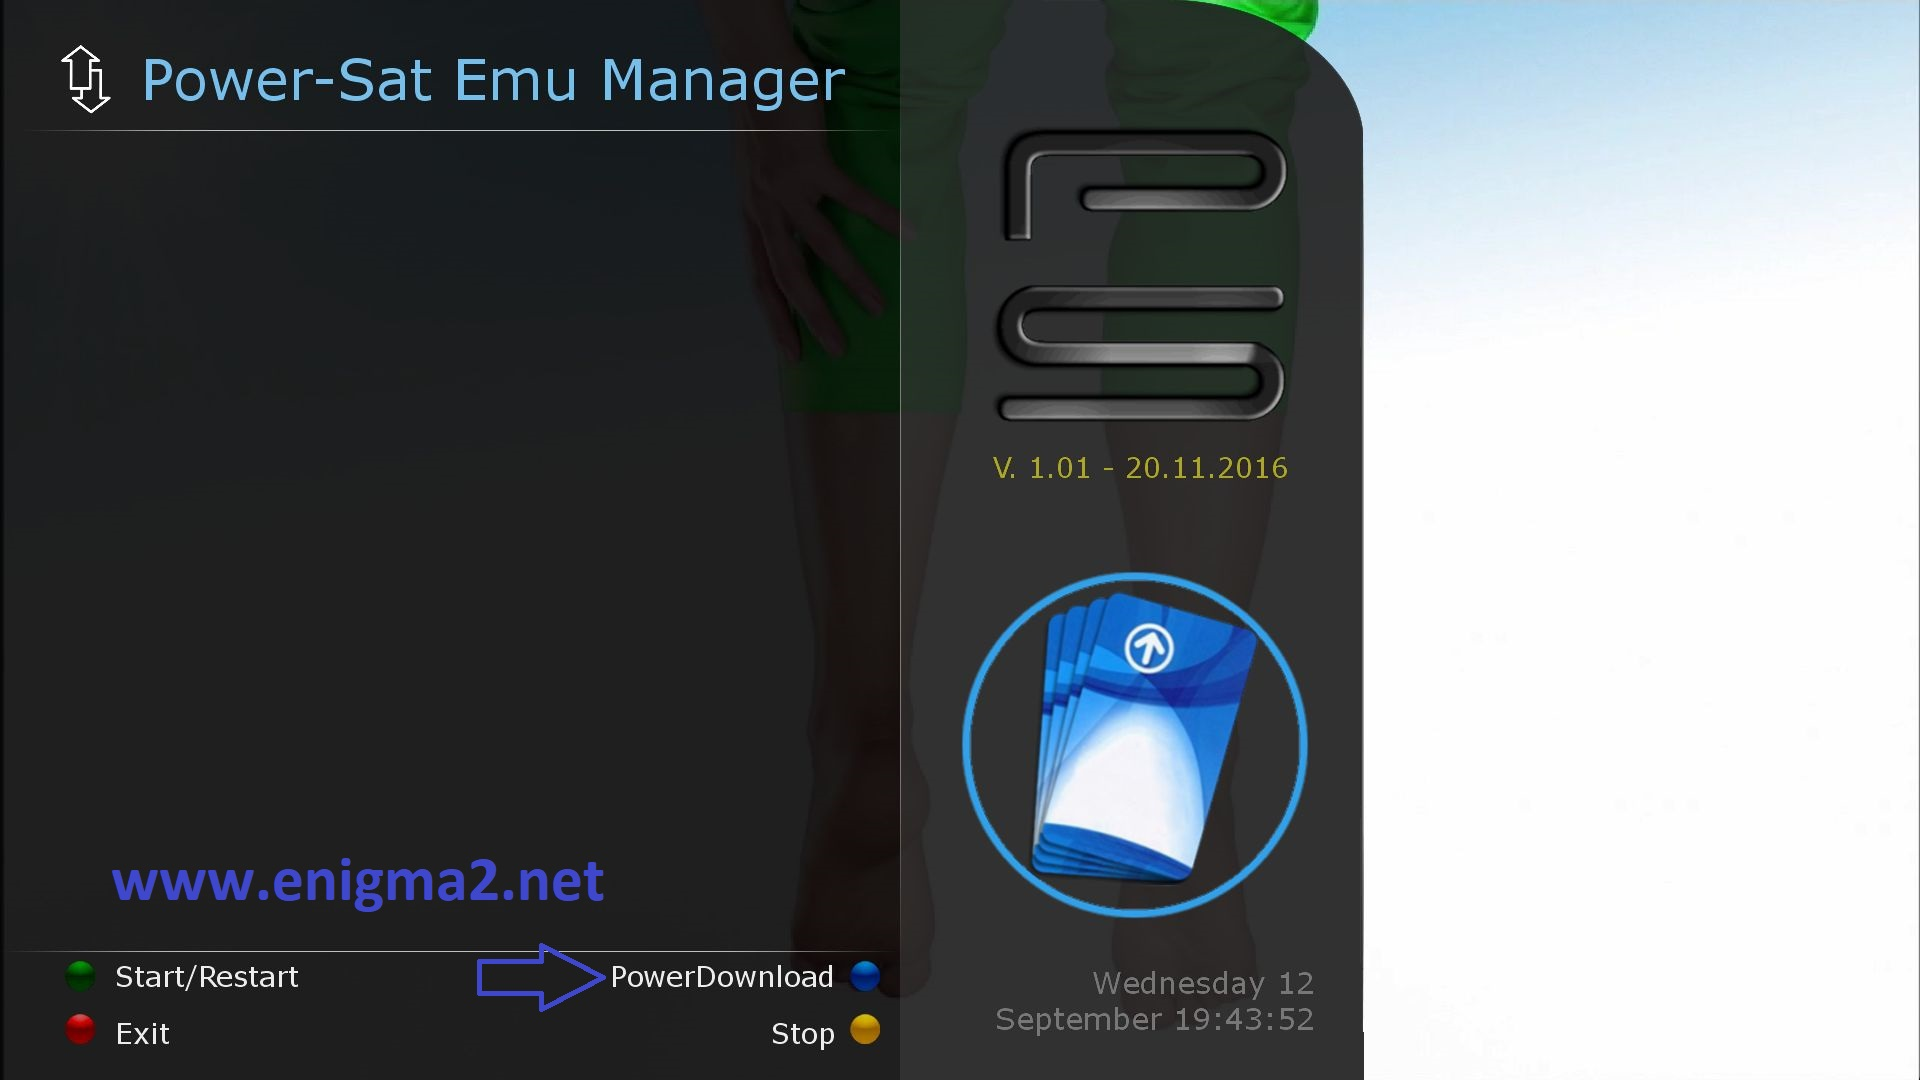 Oscam enigma2 download